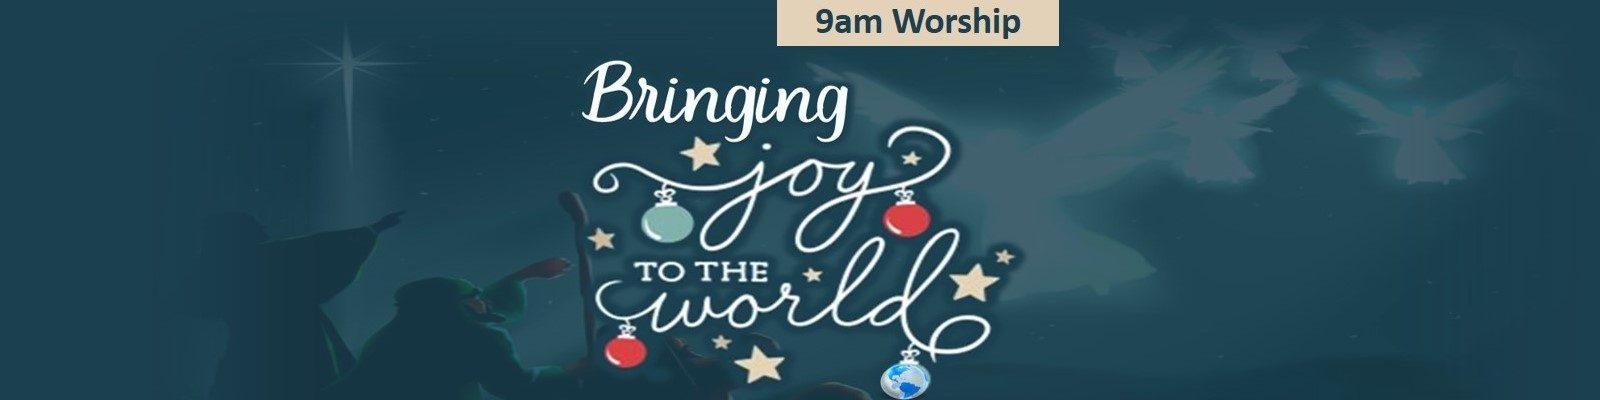 Kids Church Handout for Sunday 29 Nov - Advent 1